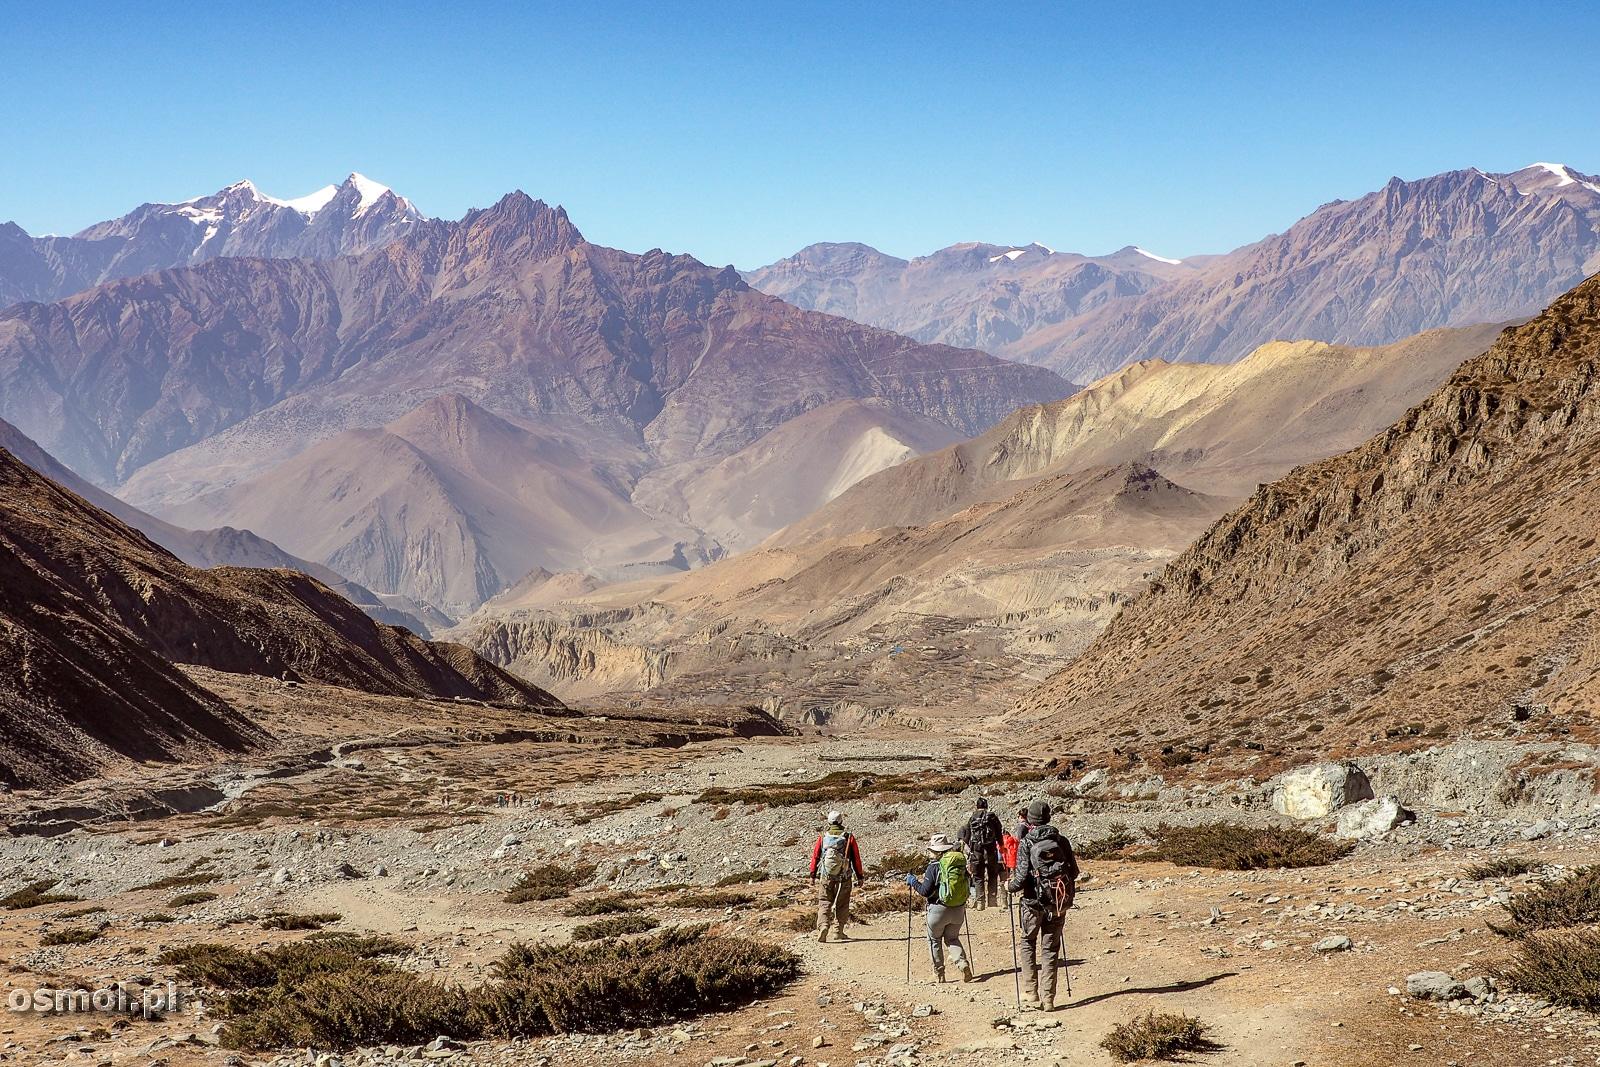 Turyści na trekkingu dookola Annapurny